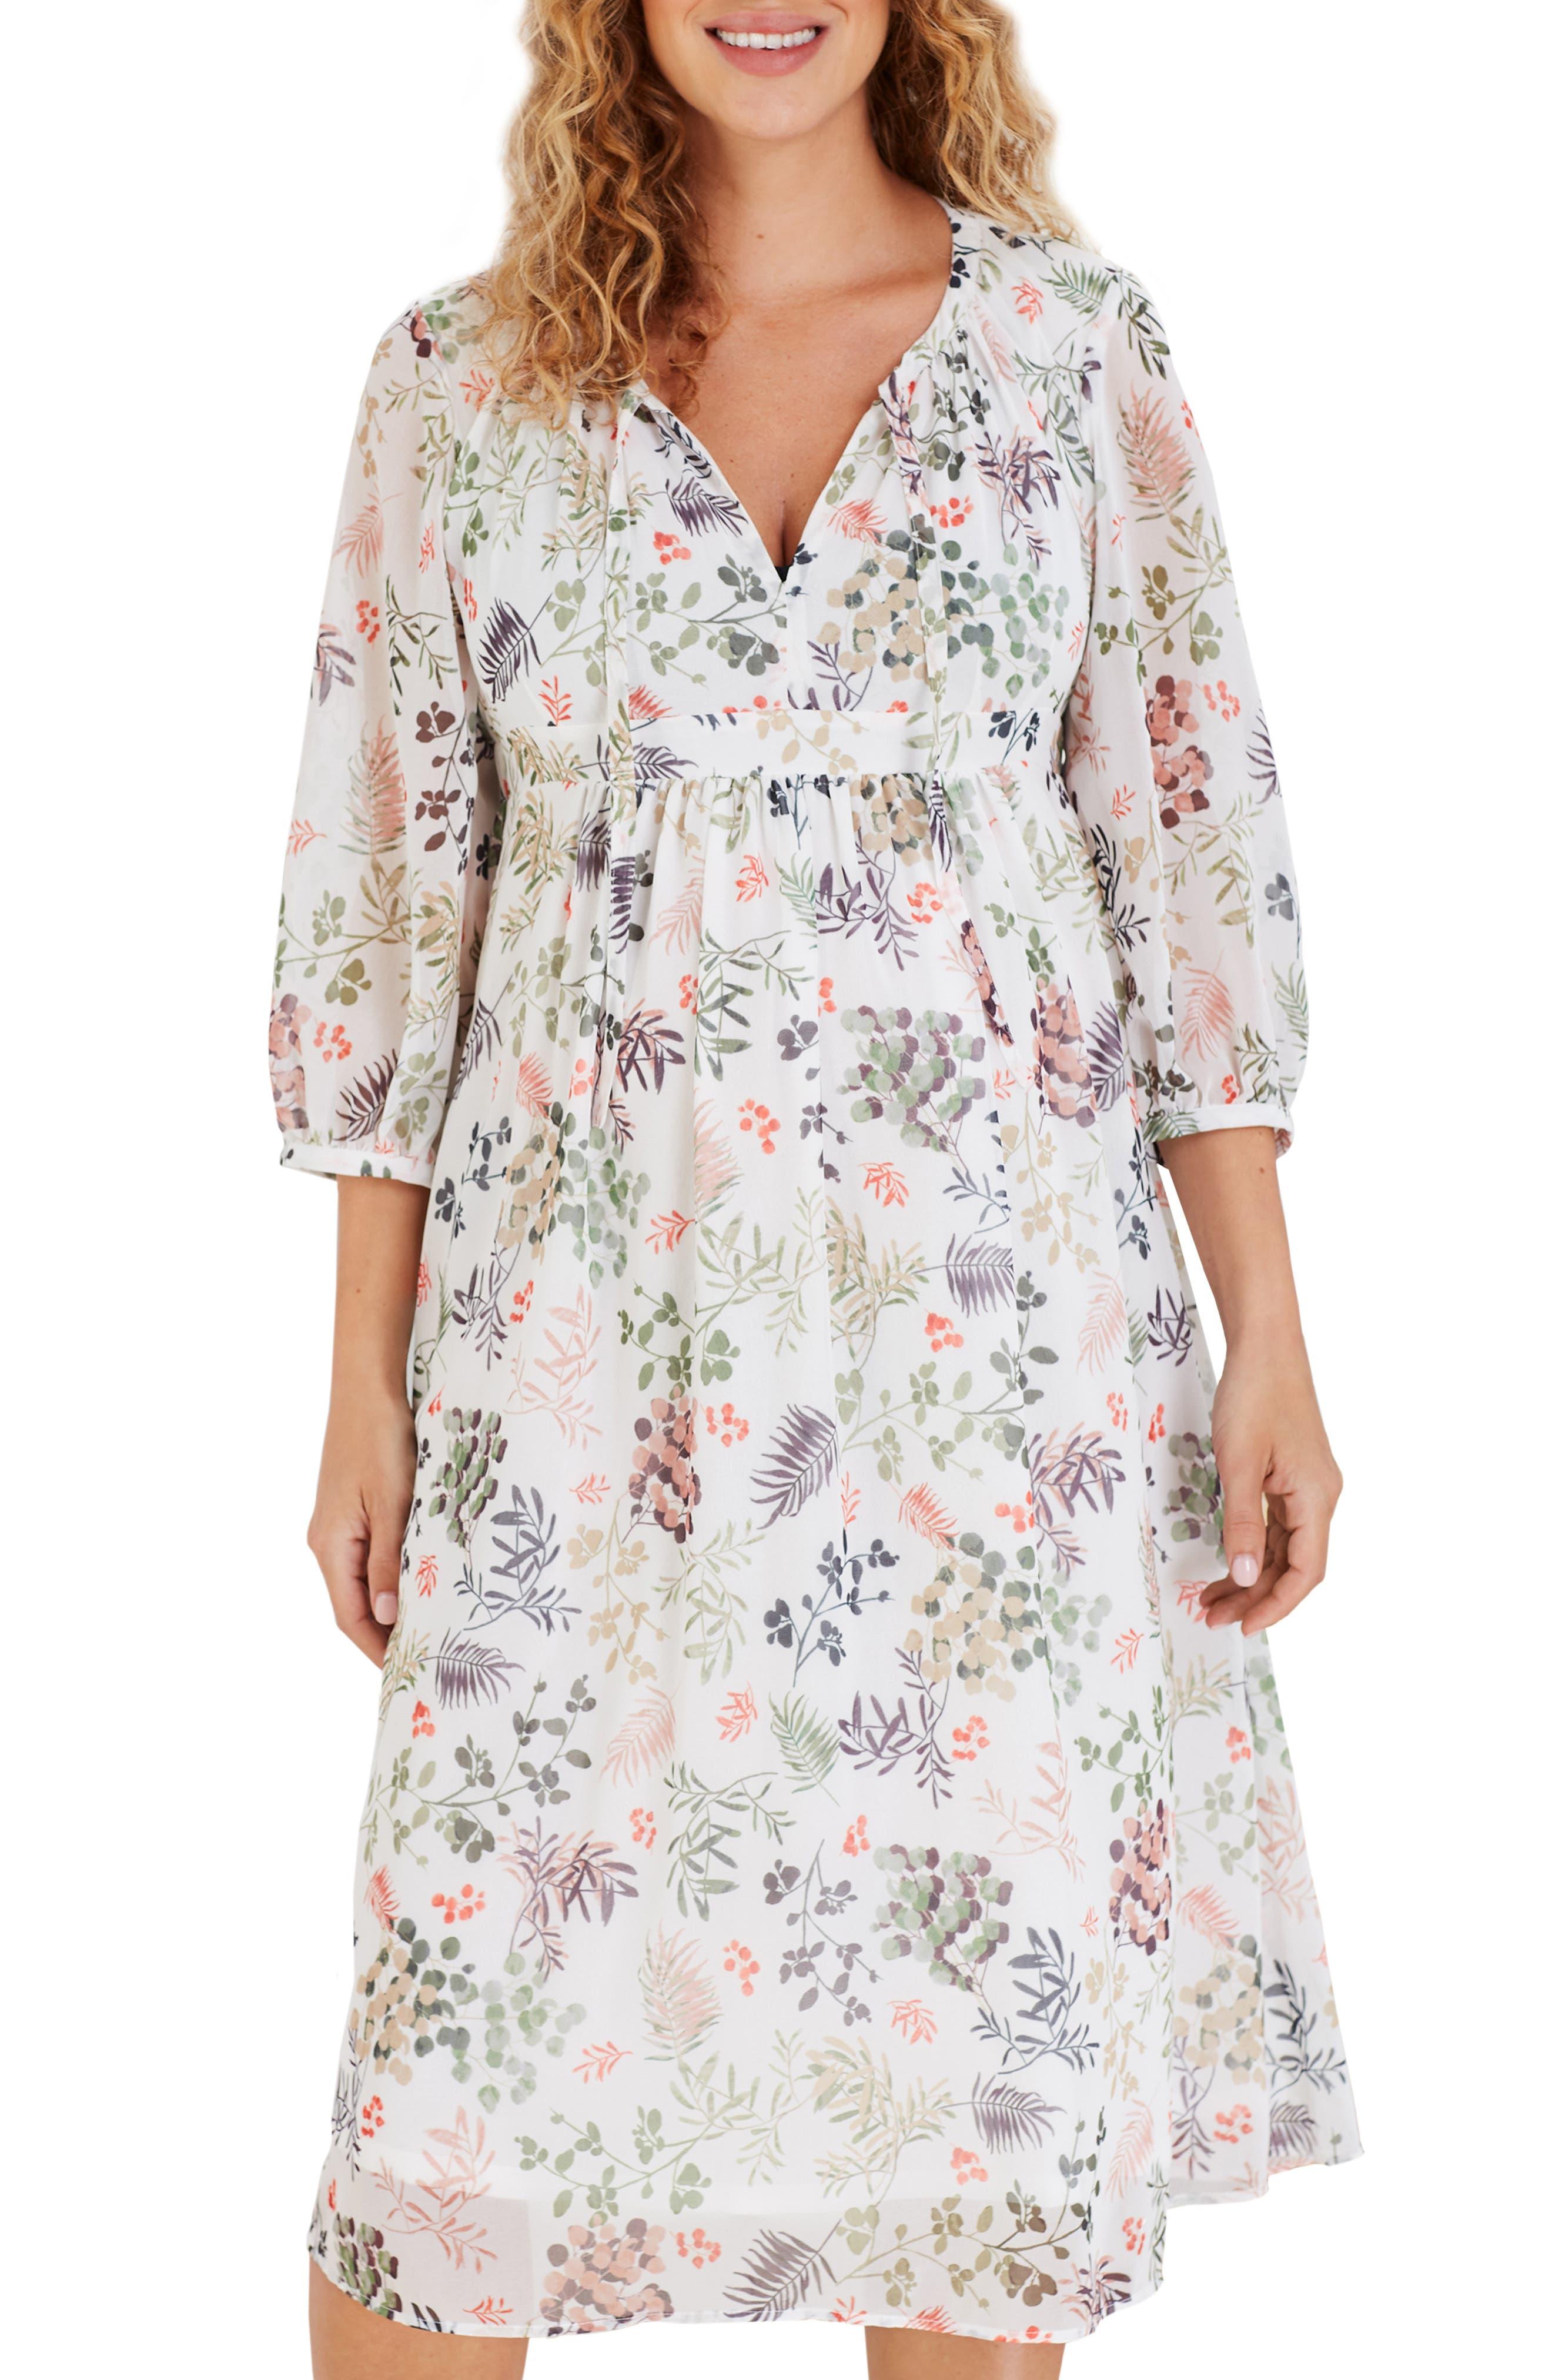 Posie Leaf Print Maternity Dress